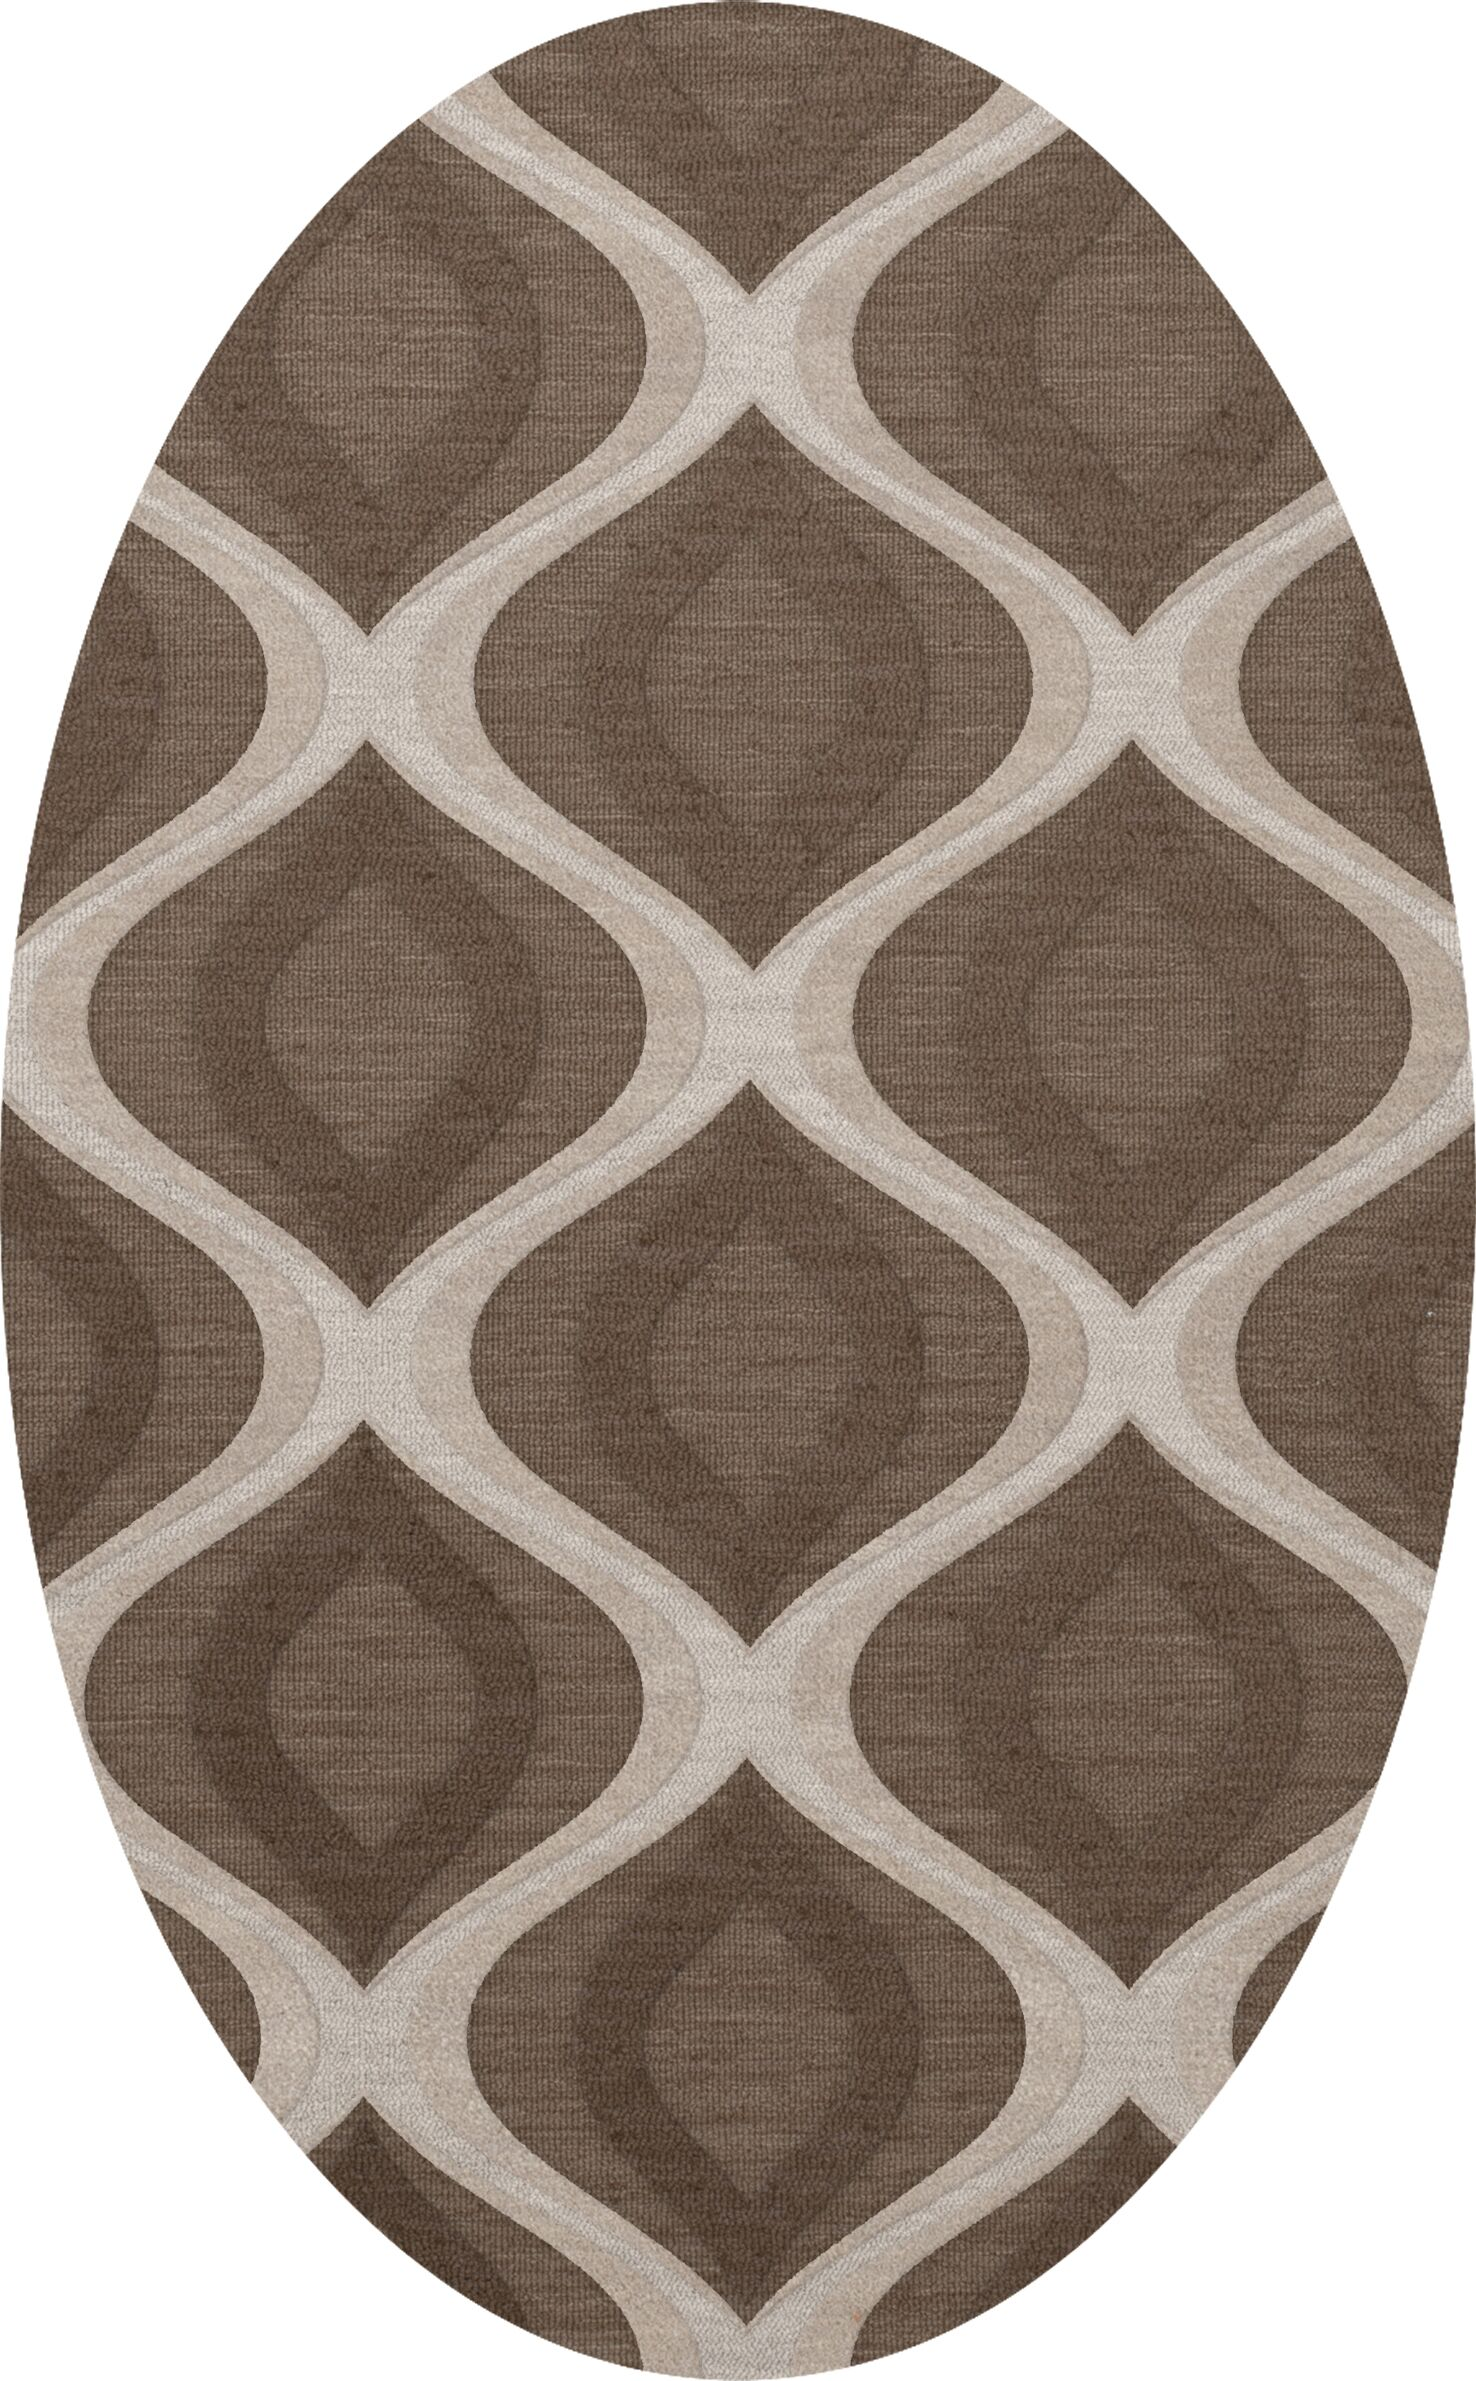 Kaidence Wool Pebble Area Rug Rug Size: Oval 12' x 18'